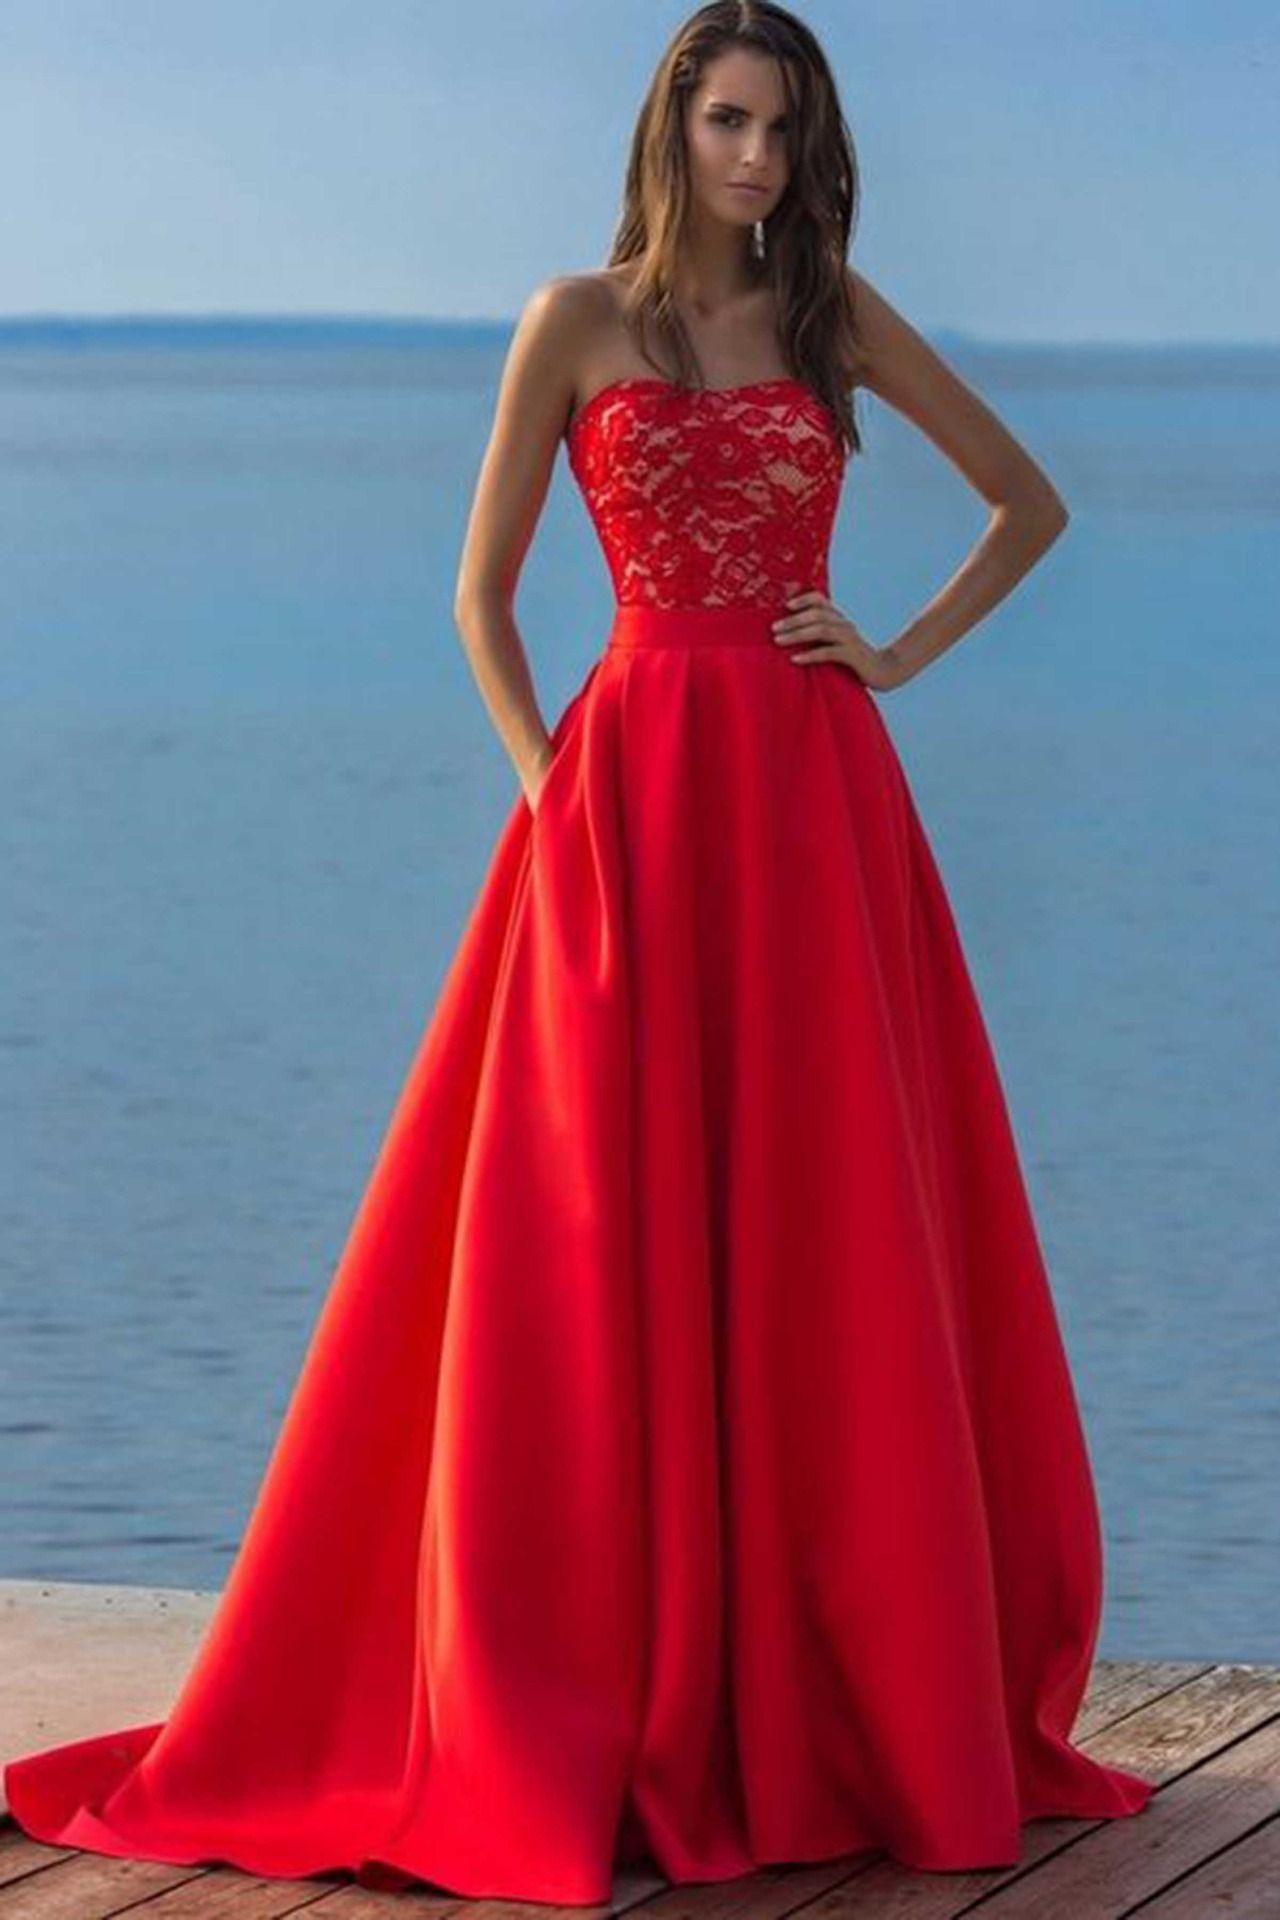 Red lace chiffon prom dress formal dress cute sweetheart dress for